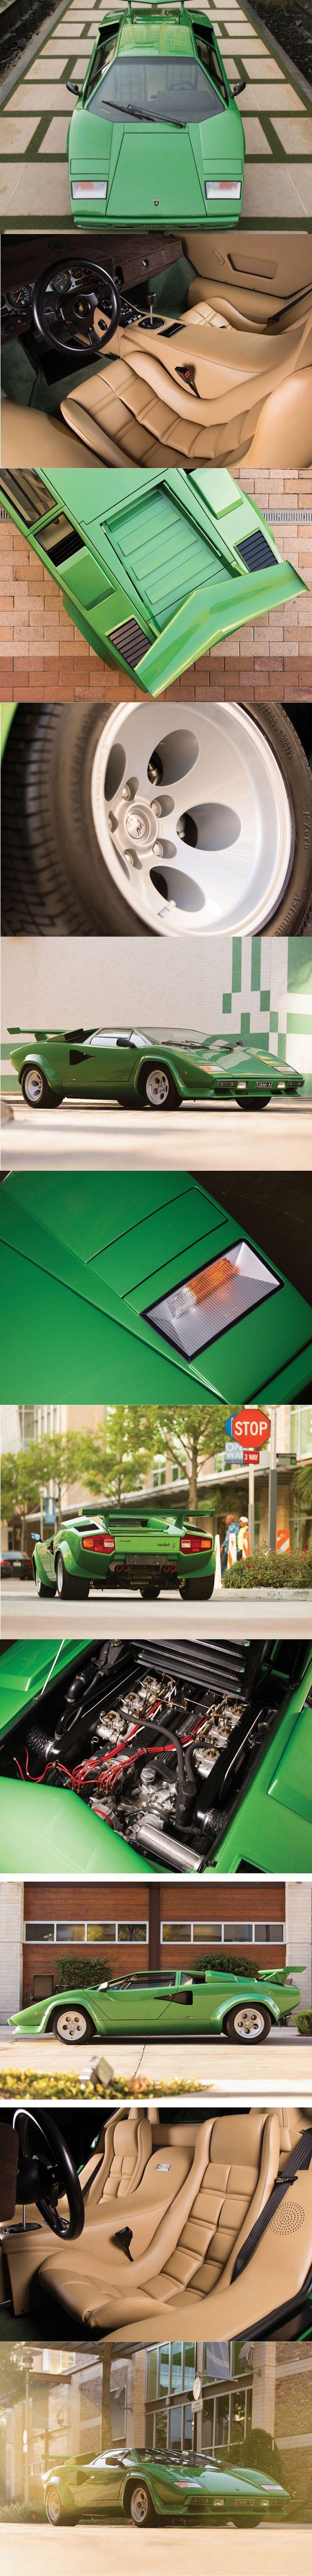 e5376d725f2f2a08aab8782f1ac5108f Astounding Lamborghini Countach Built In Basement Cars Trend